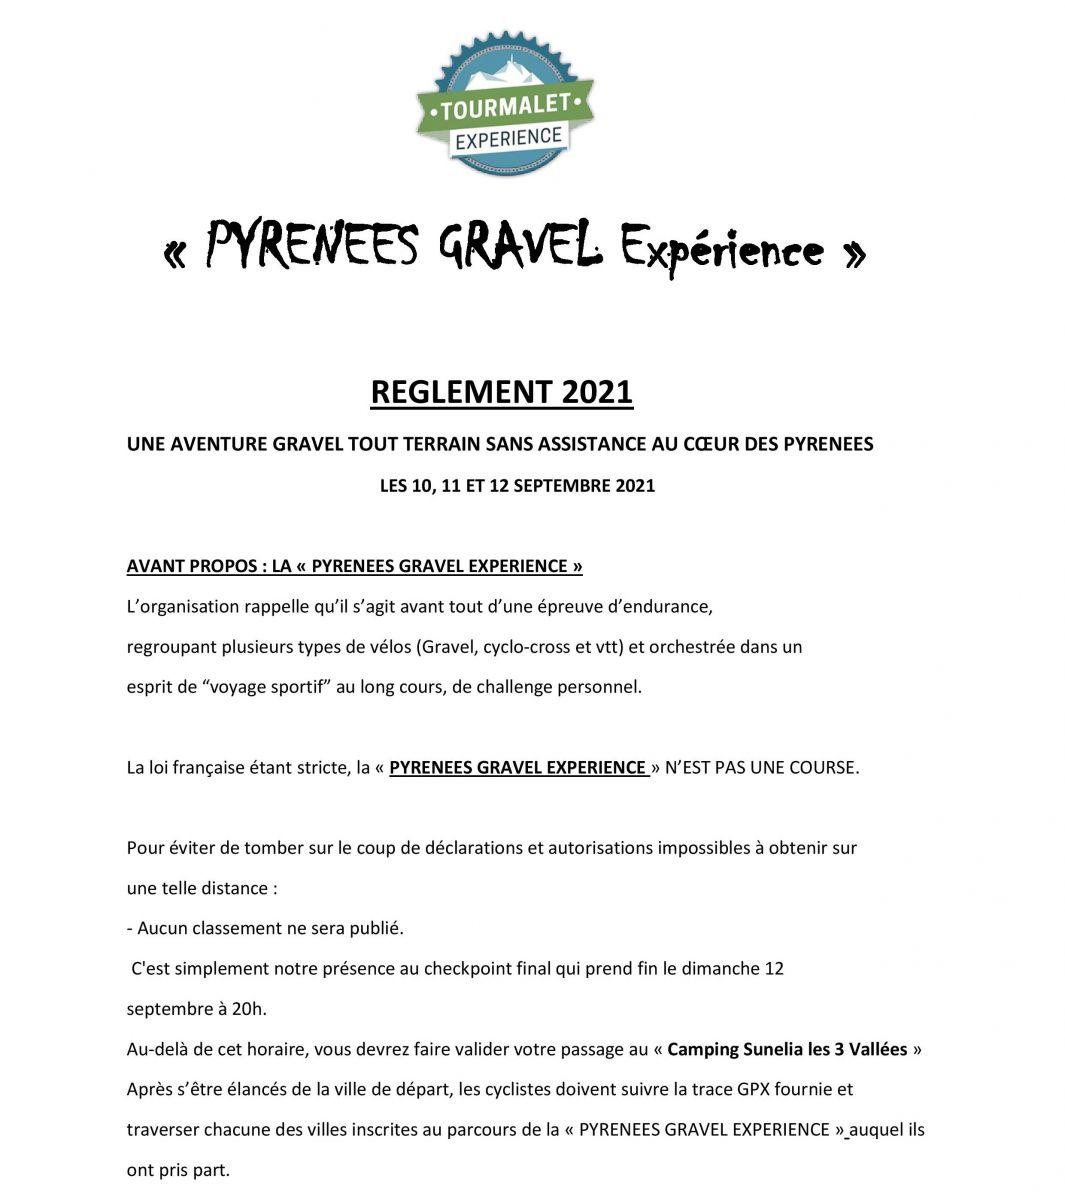 réglement 2021 PYRENEES GRAVEL EXPERIENCE-page-001